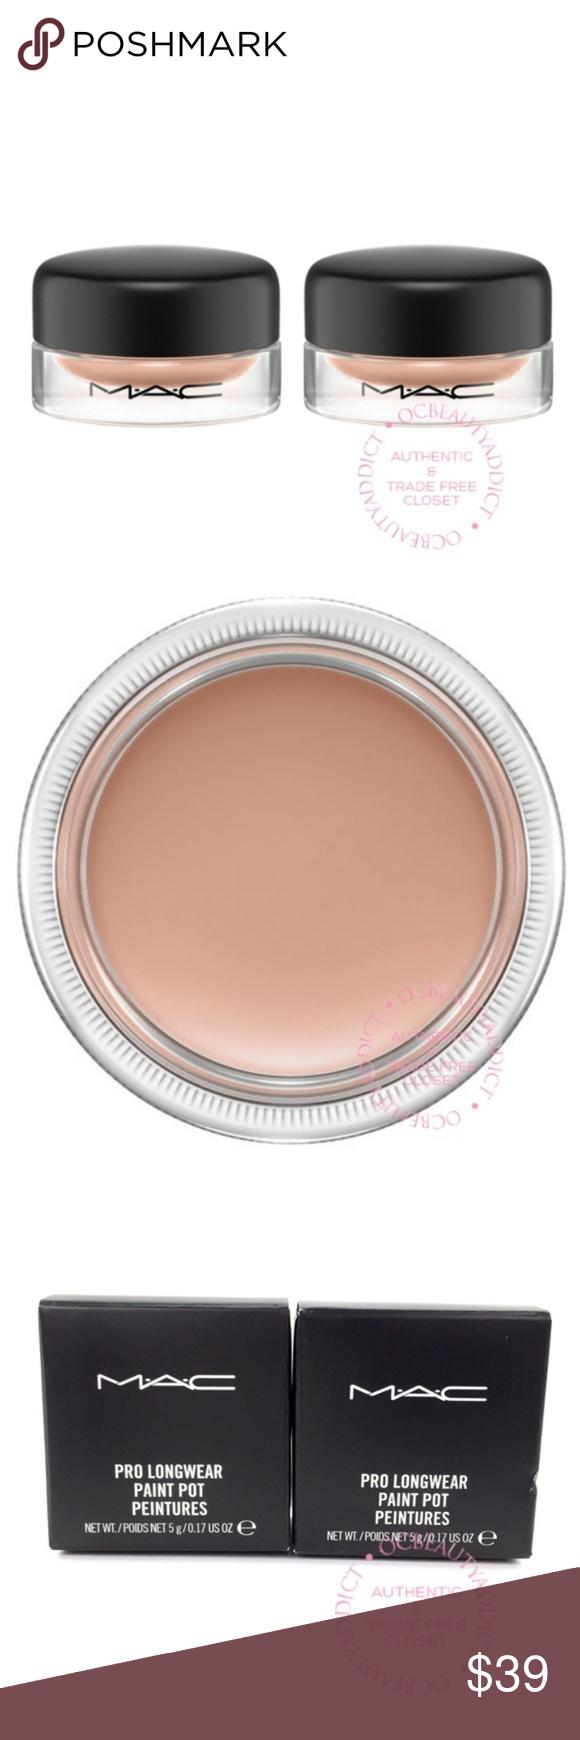 2x MAC Cosmetics Pro Longwear Paint Pot Painterly